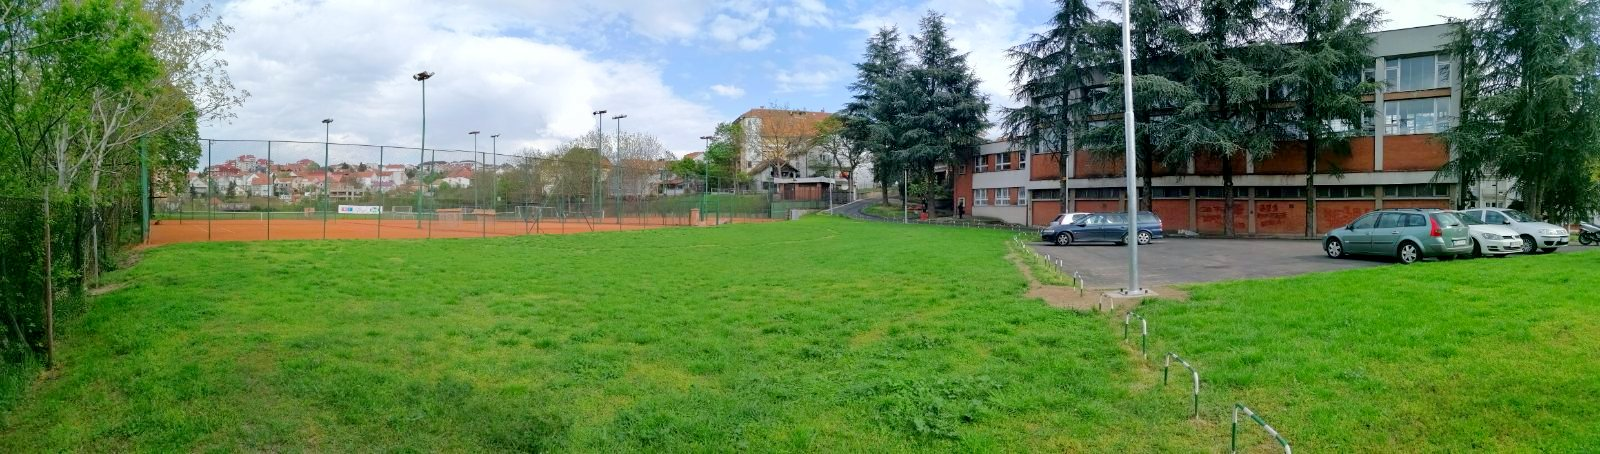 Teniski tereni teniskog kluba Dril u Žarkovu